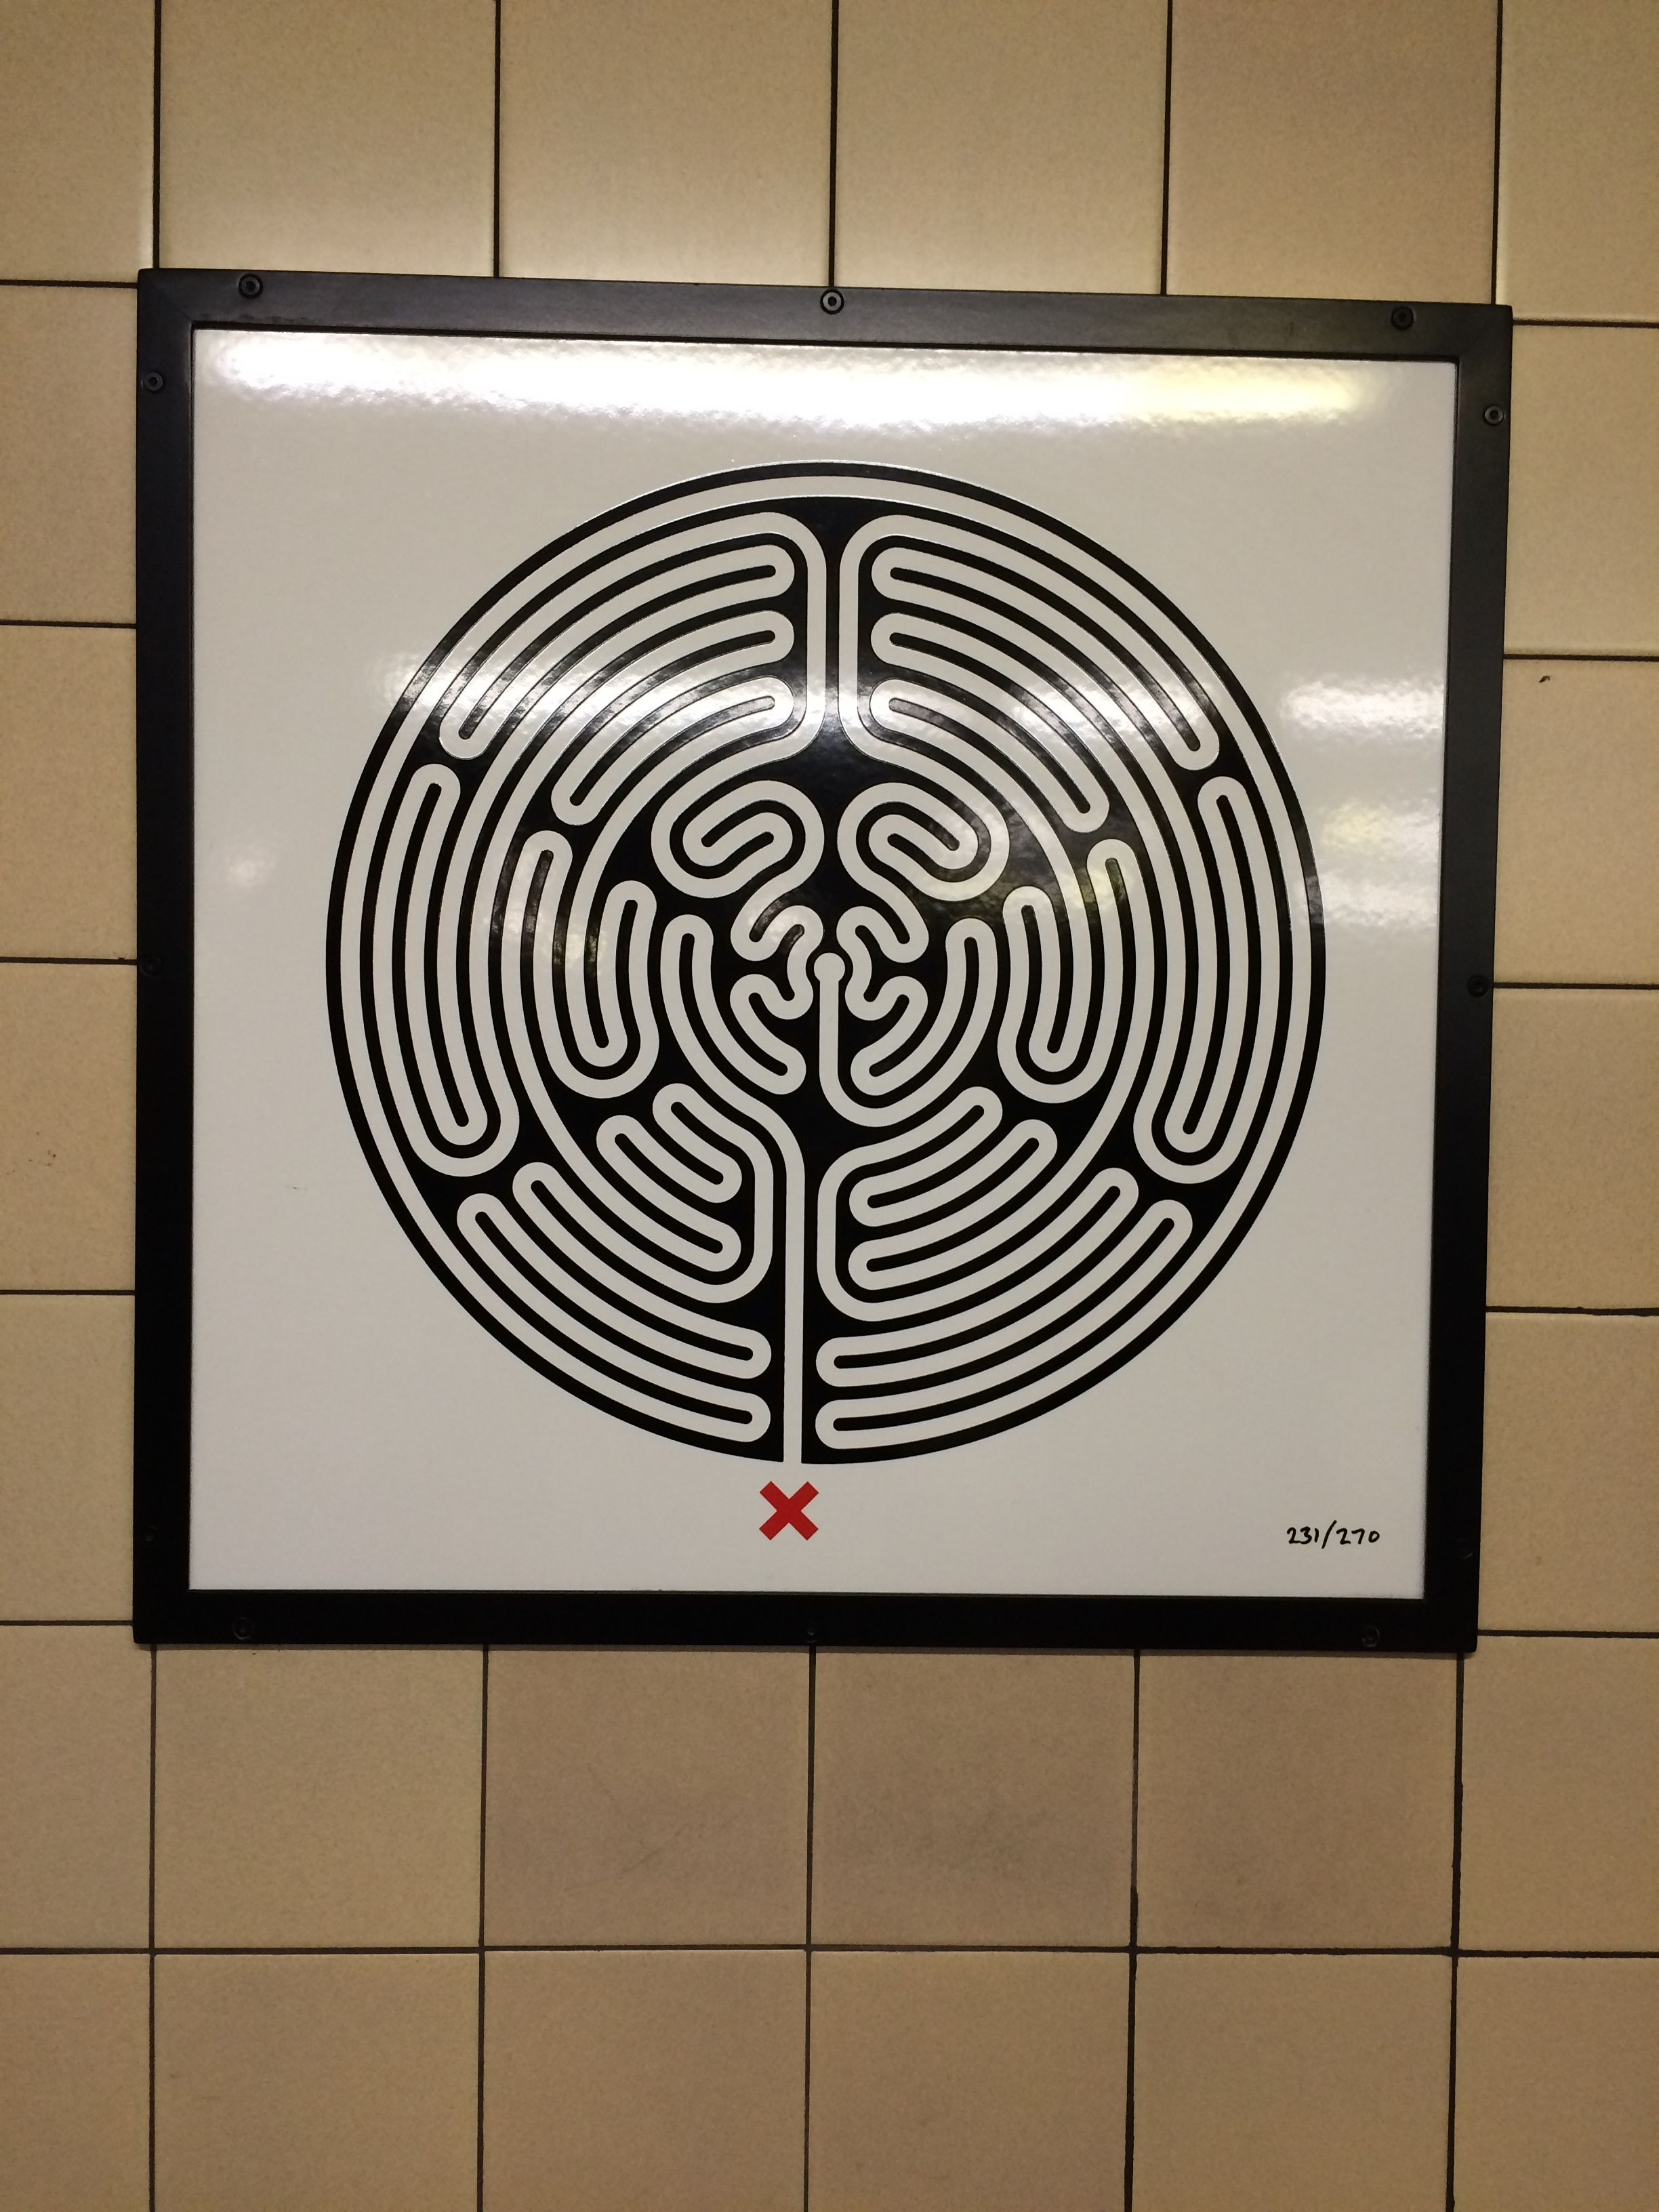 Pin By Kublacohn On Labyrinth